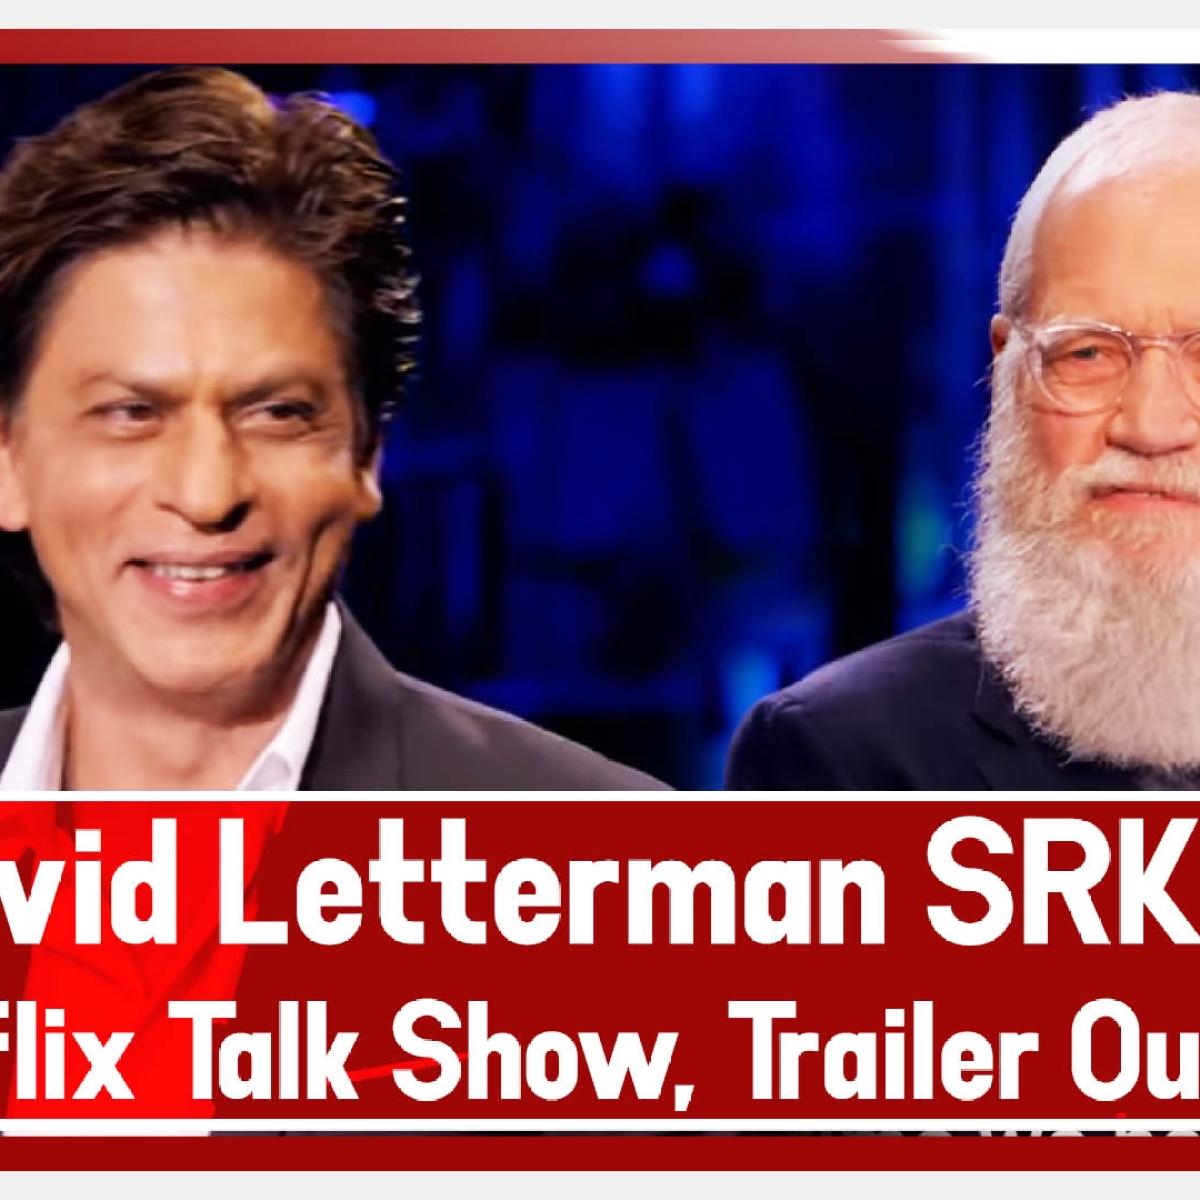 David Letterman ft. Shah Rukh Khan On Netflix Talk Show, Trailer Out